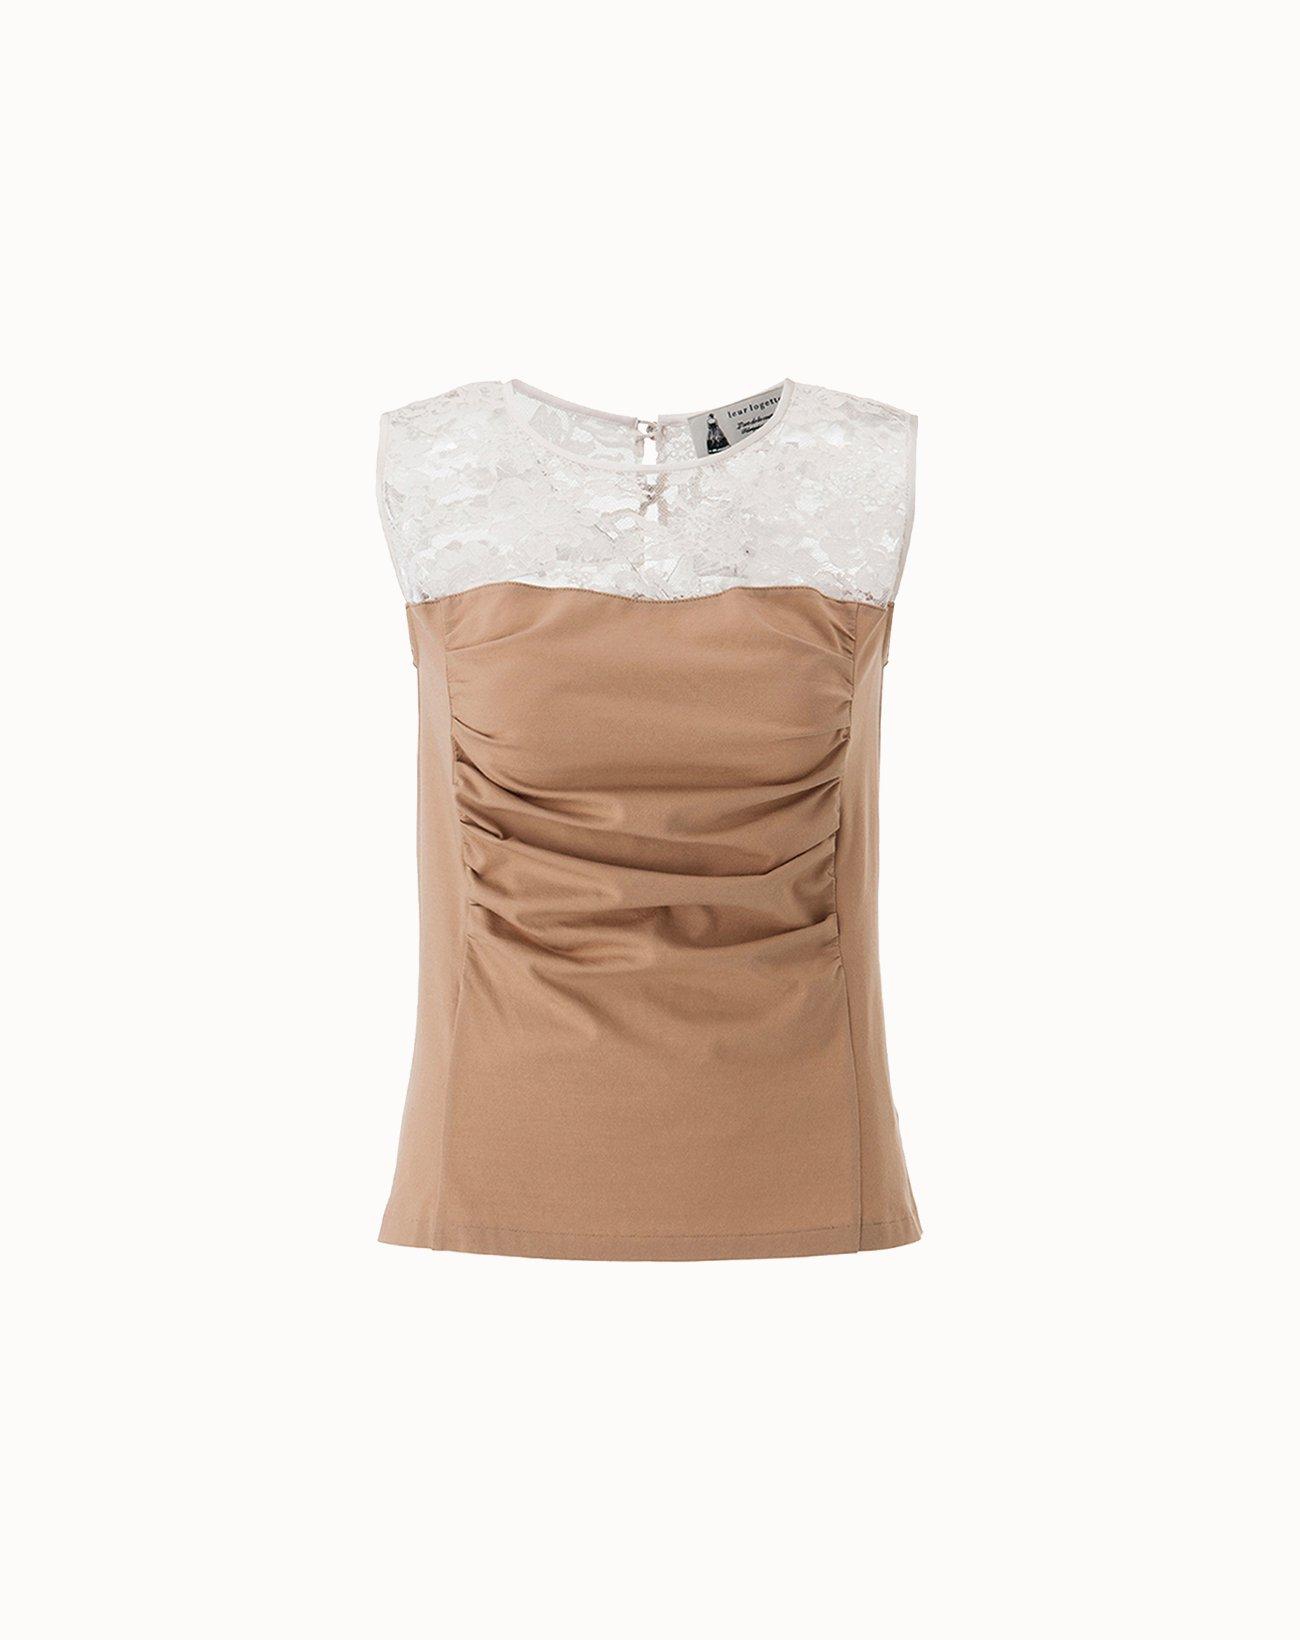 leur logette - Stretch Cotton Sleeveless Top - Beige